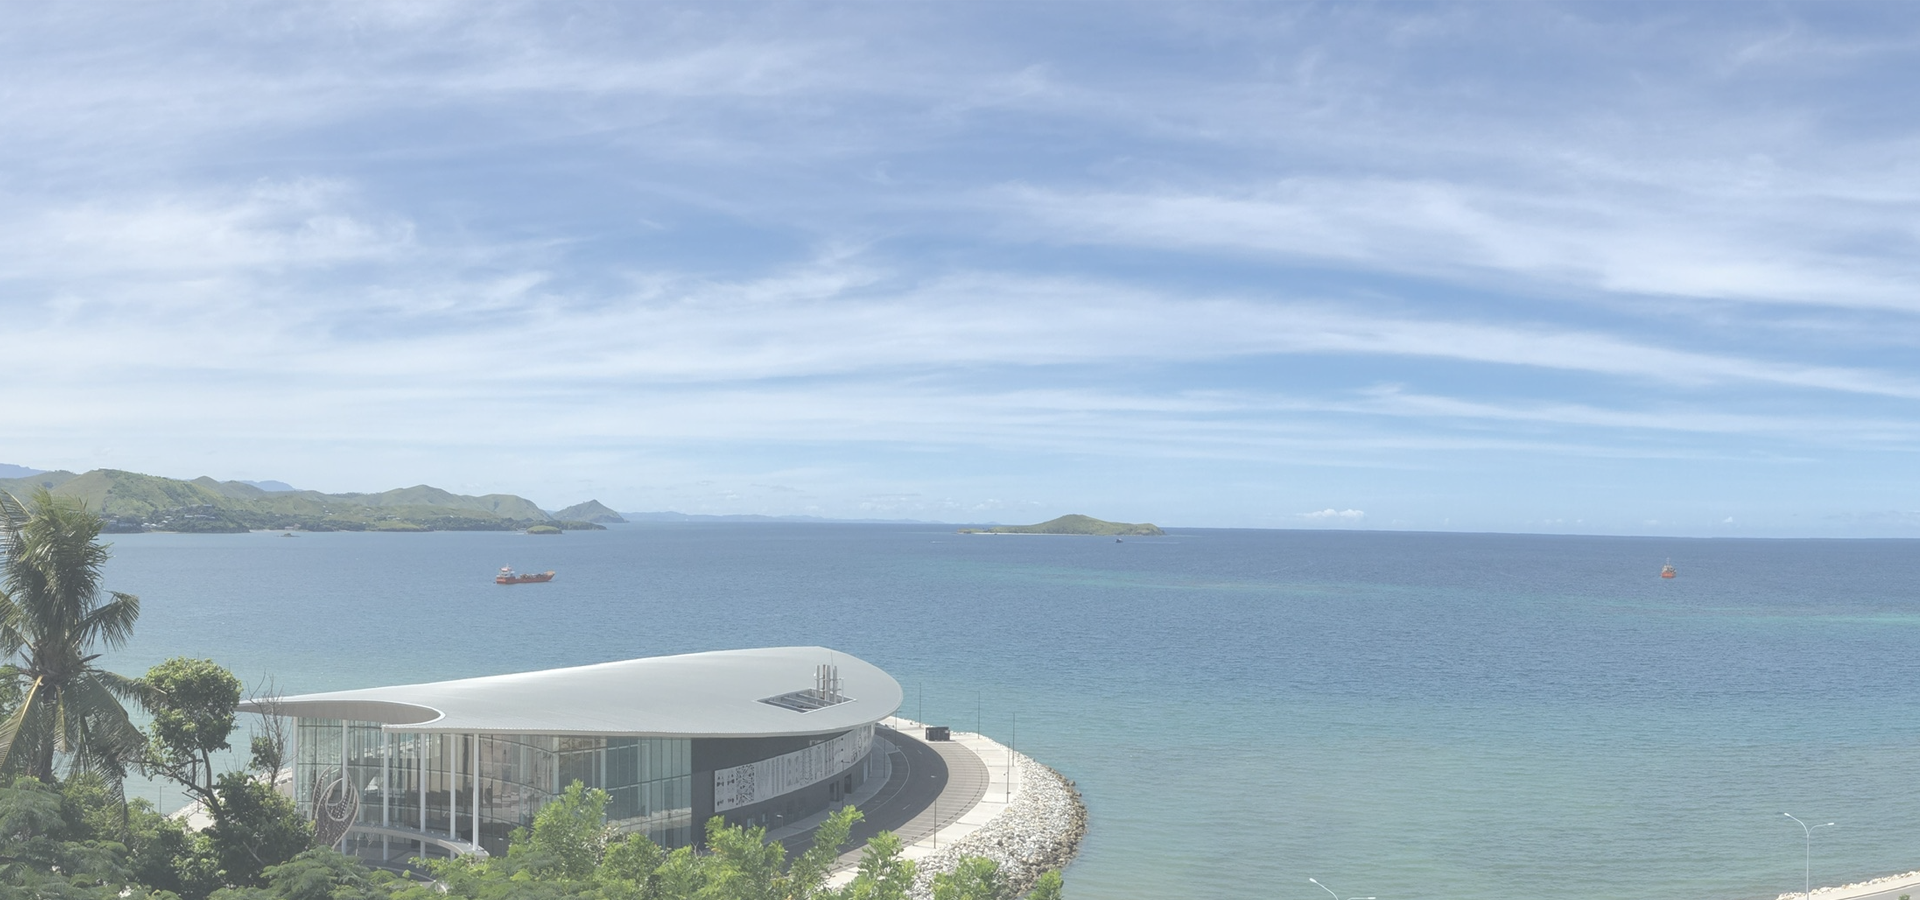 Port Moresby Time